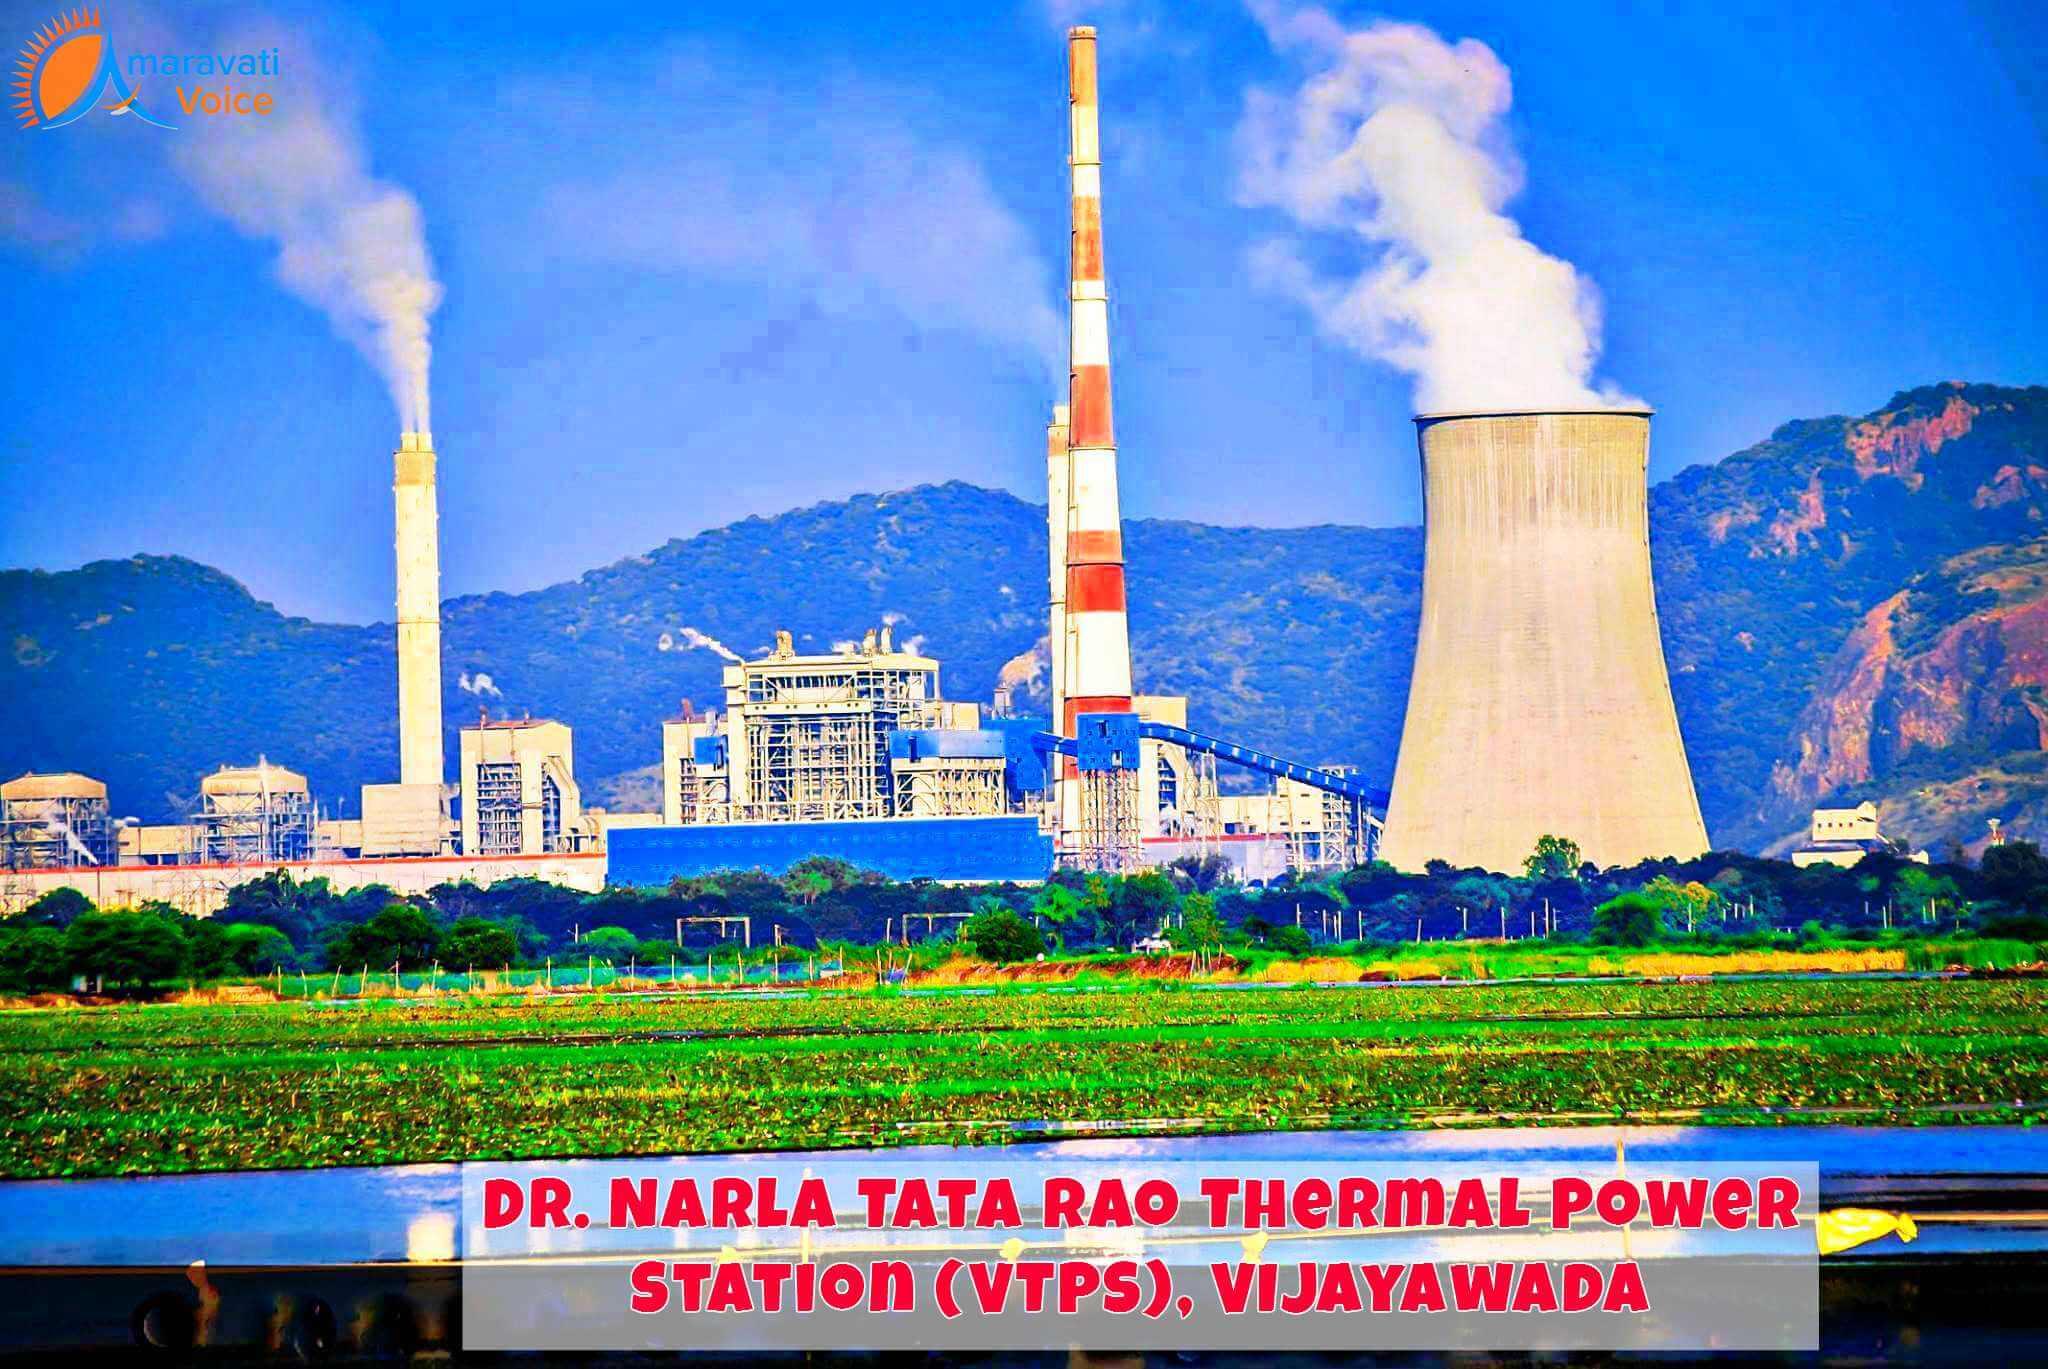 Dr Narla Tata Rao Thermal Power Station VTPS